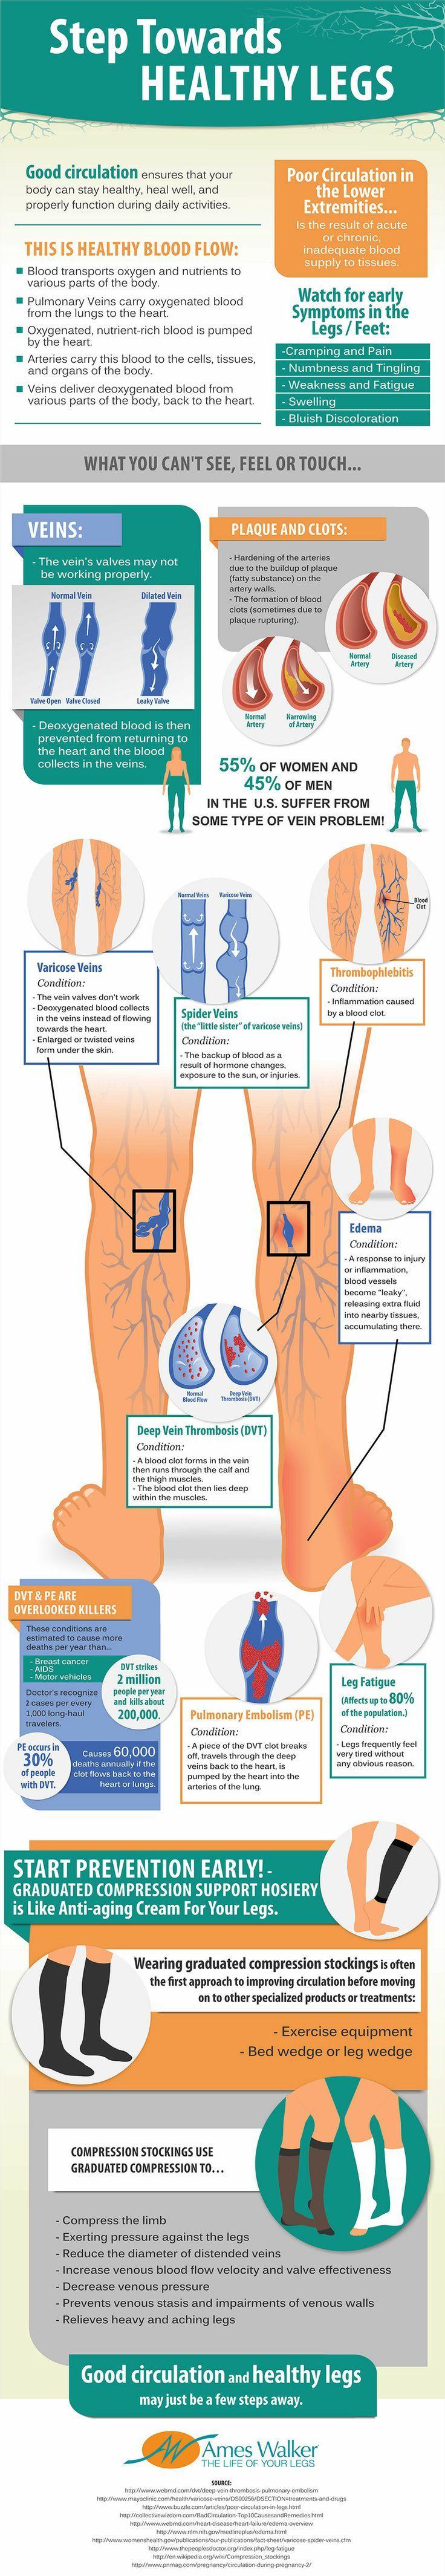 Step Towards healthy legs..